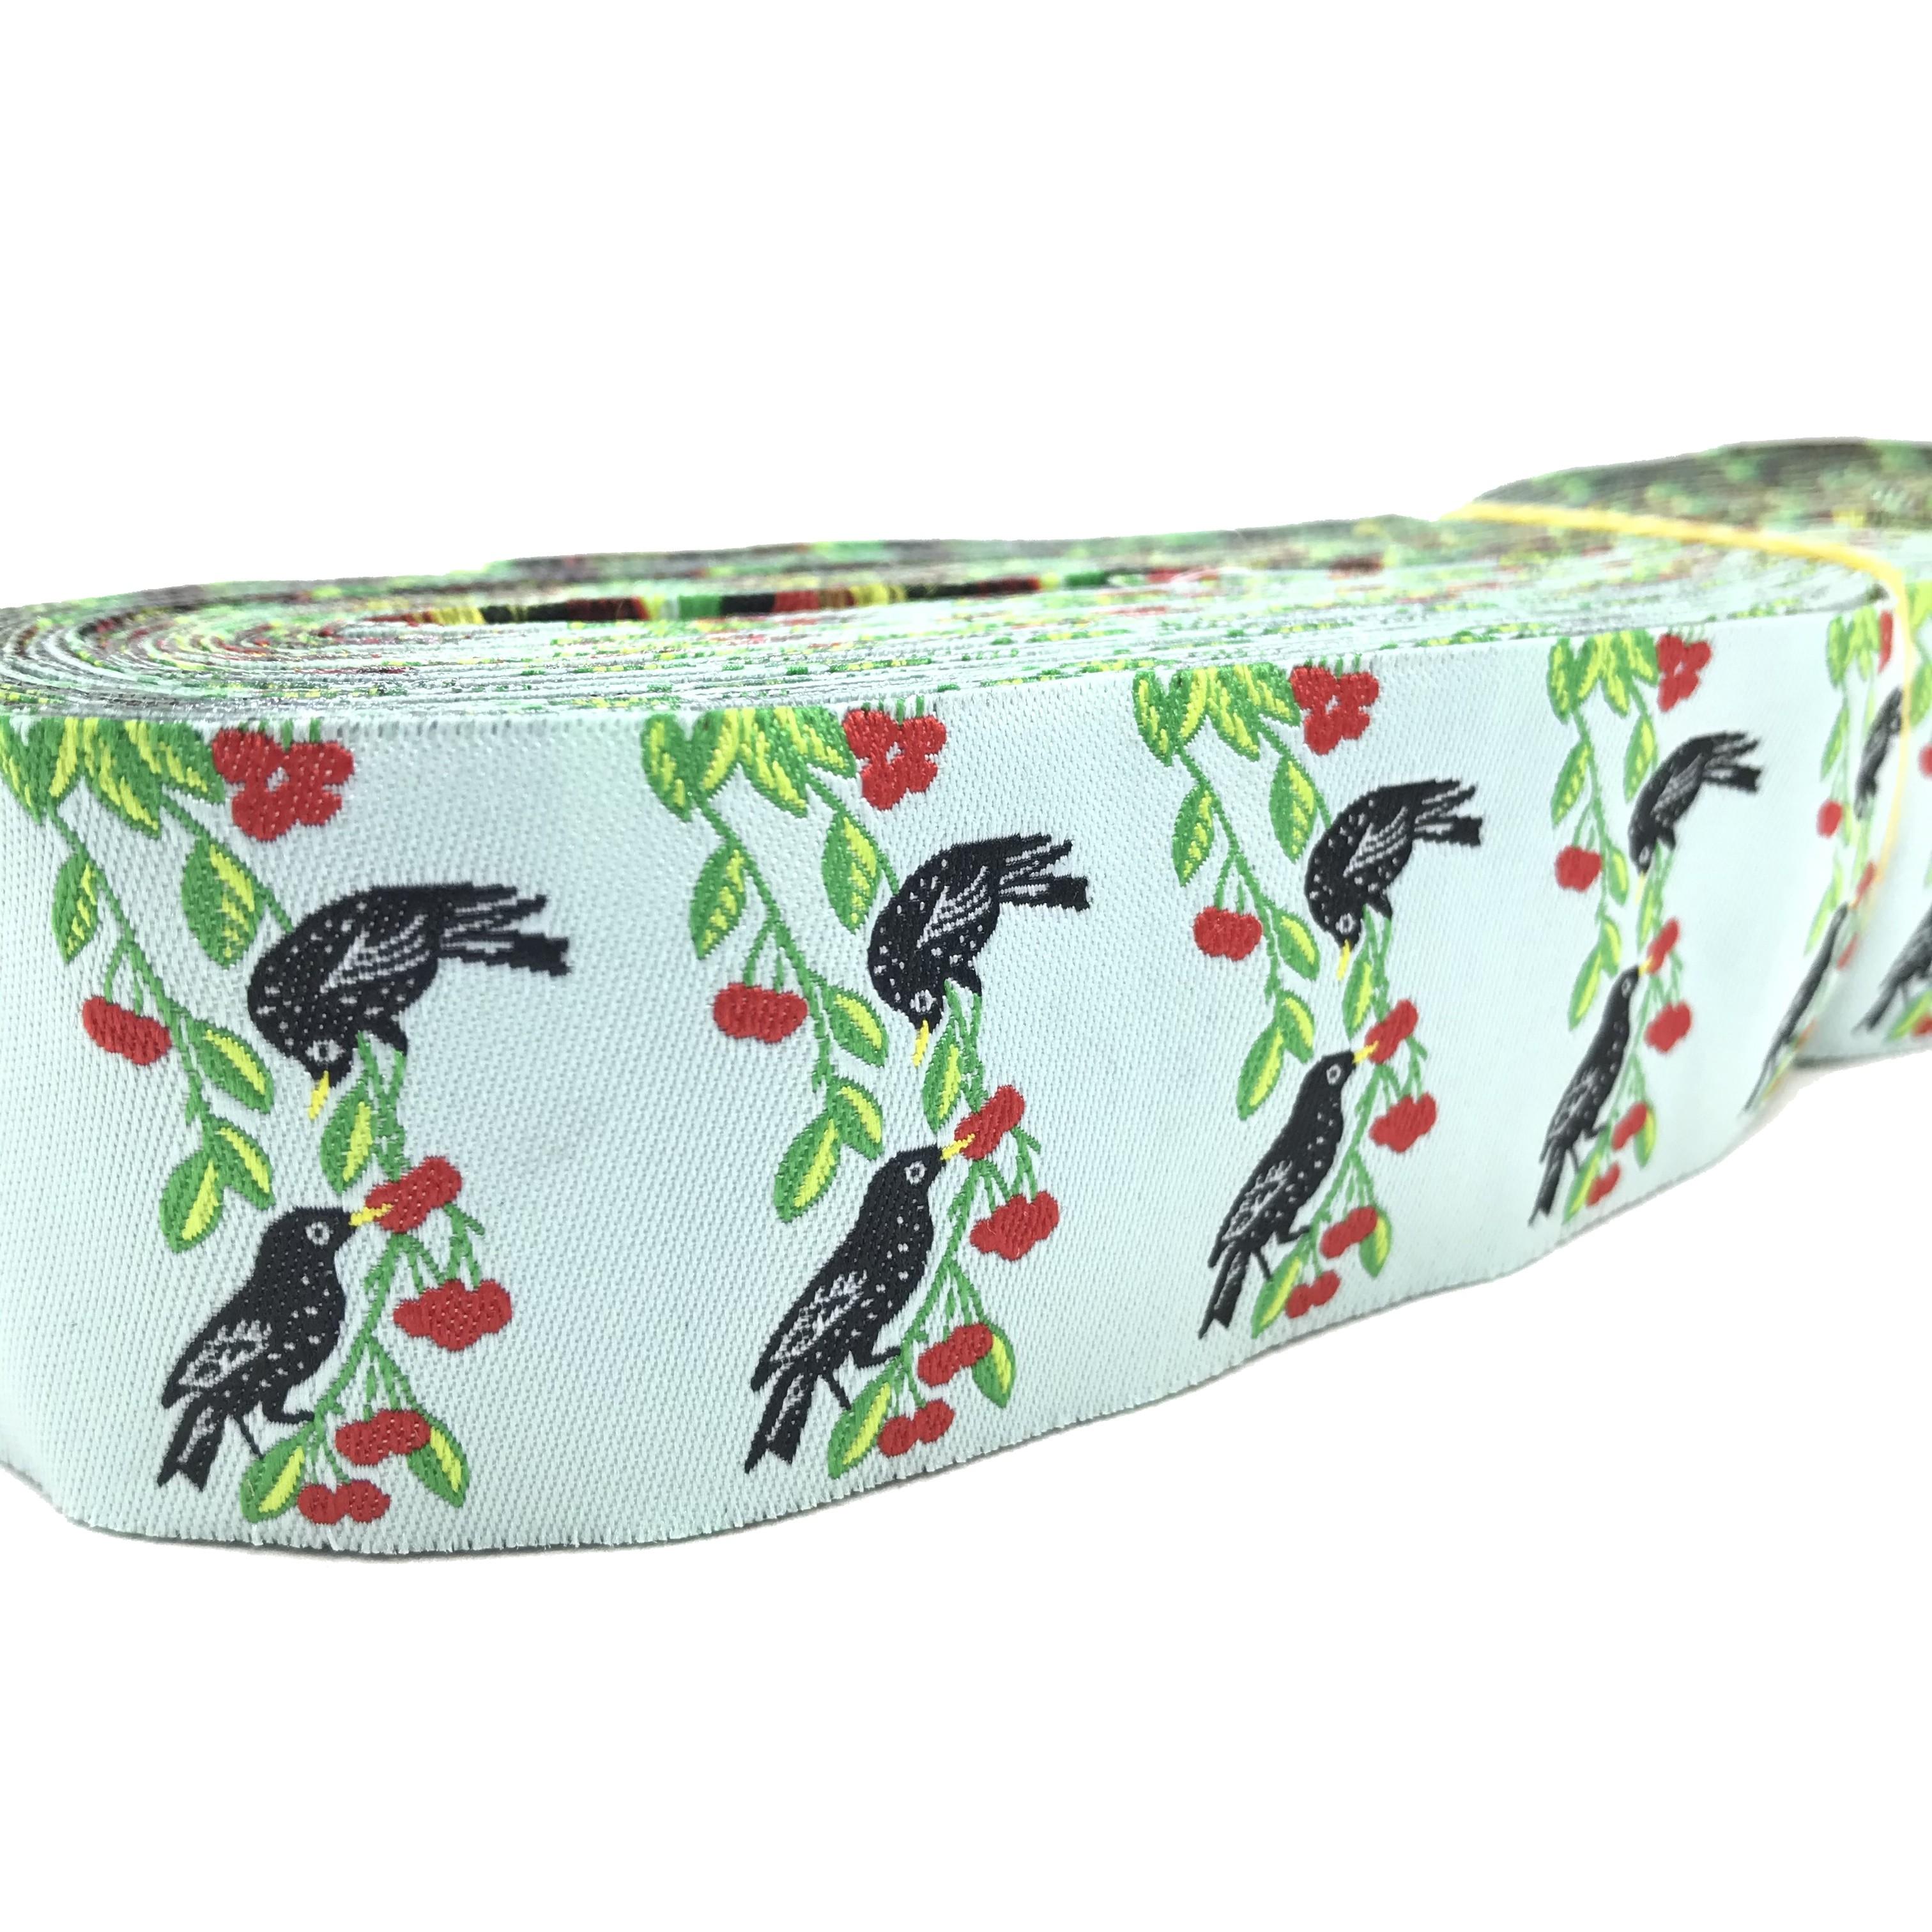 "10 meters 1.5"" 38mm Splendid Cherry and Birds European Jacquard Ribbon For Dog Collar"